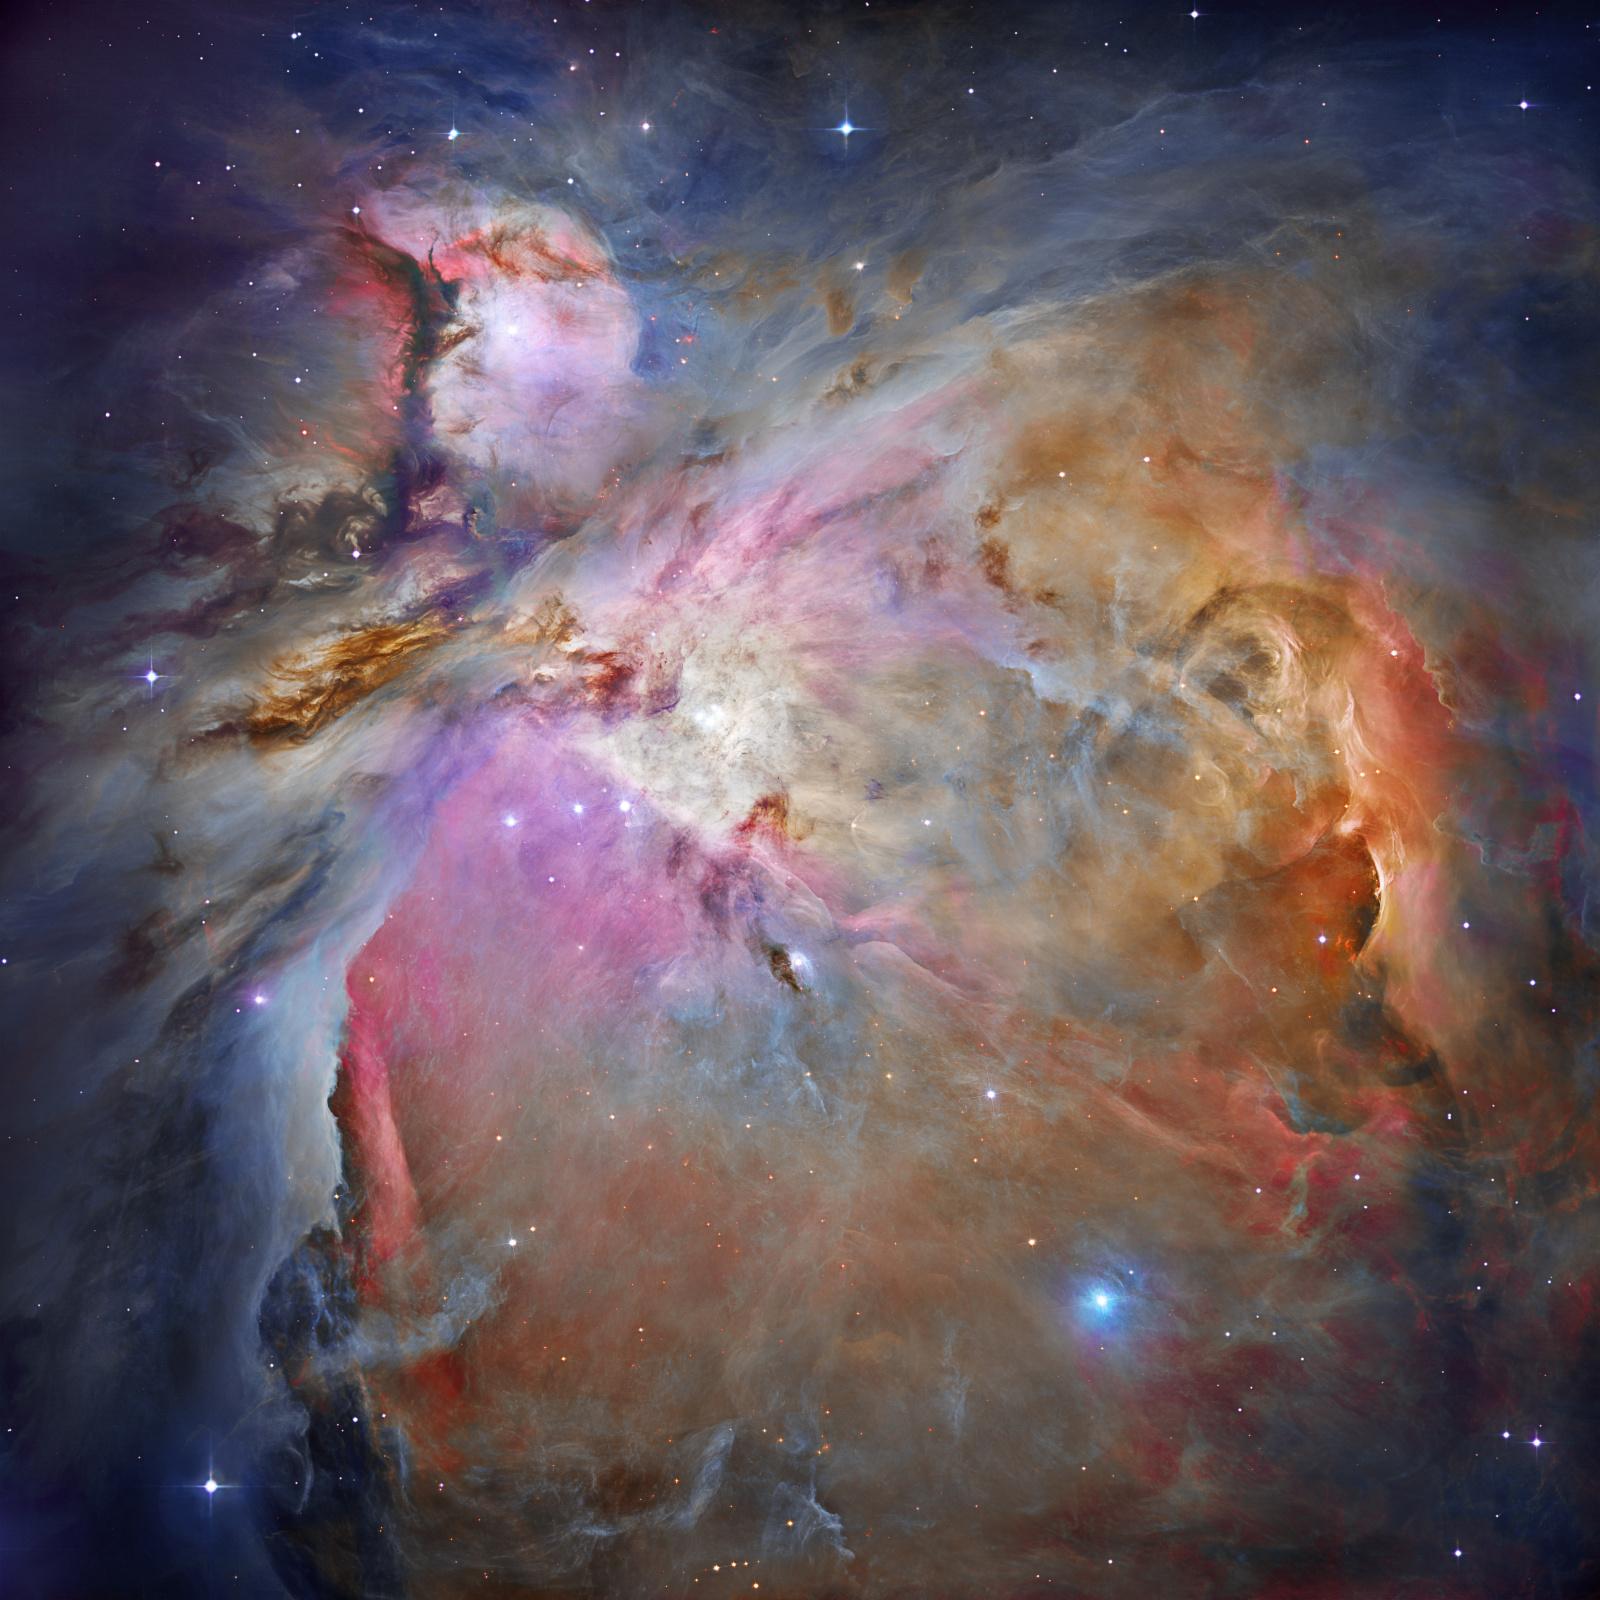 M42_Hubble_Legacy_Archive.thumb.jpg.522808aee49171d58d30eb1c25bf92f9.jpg